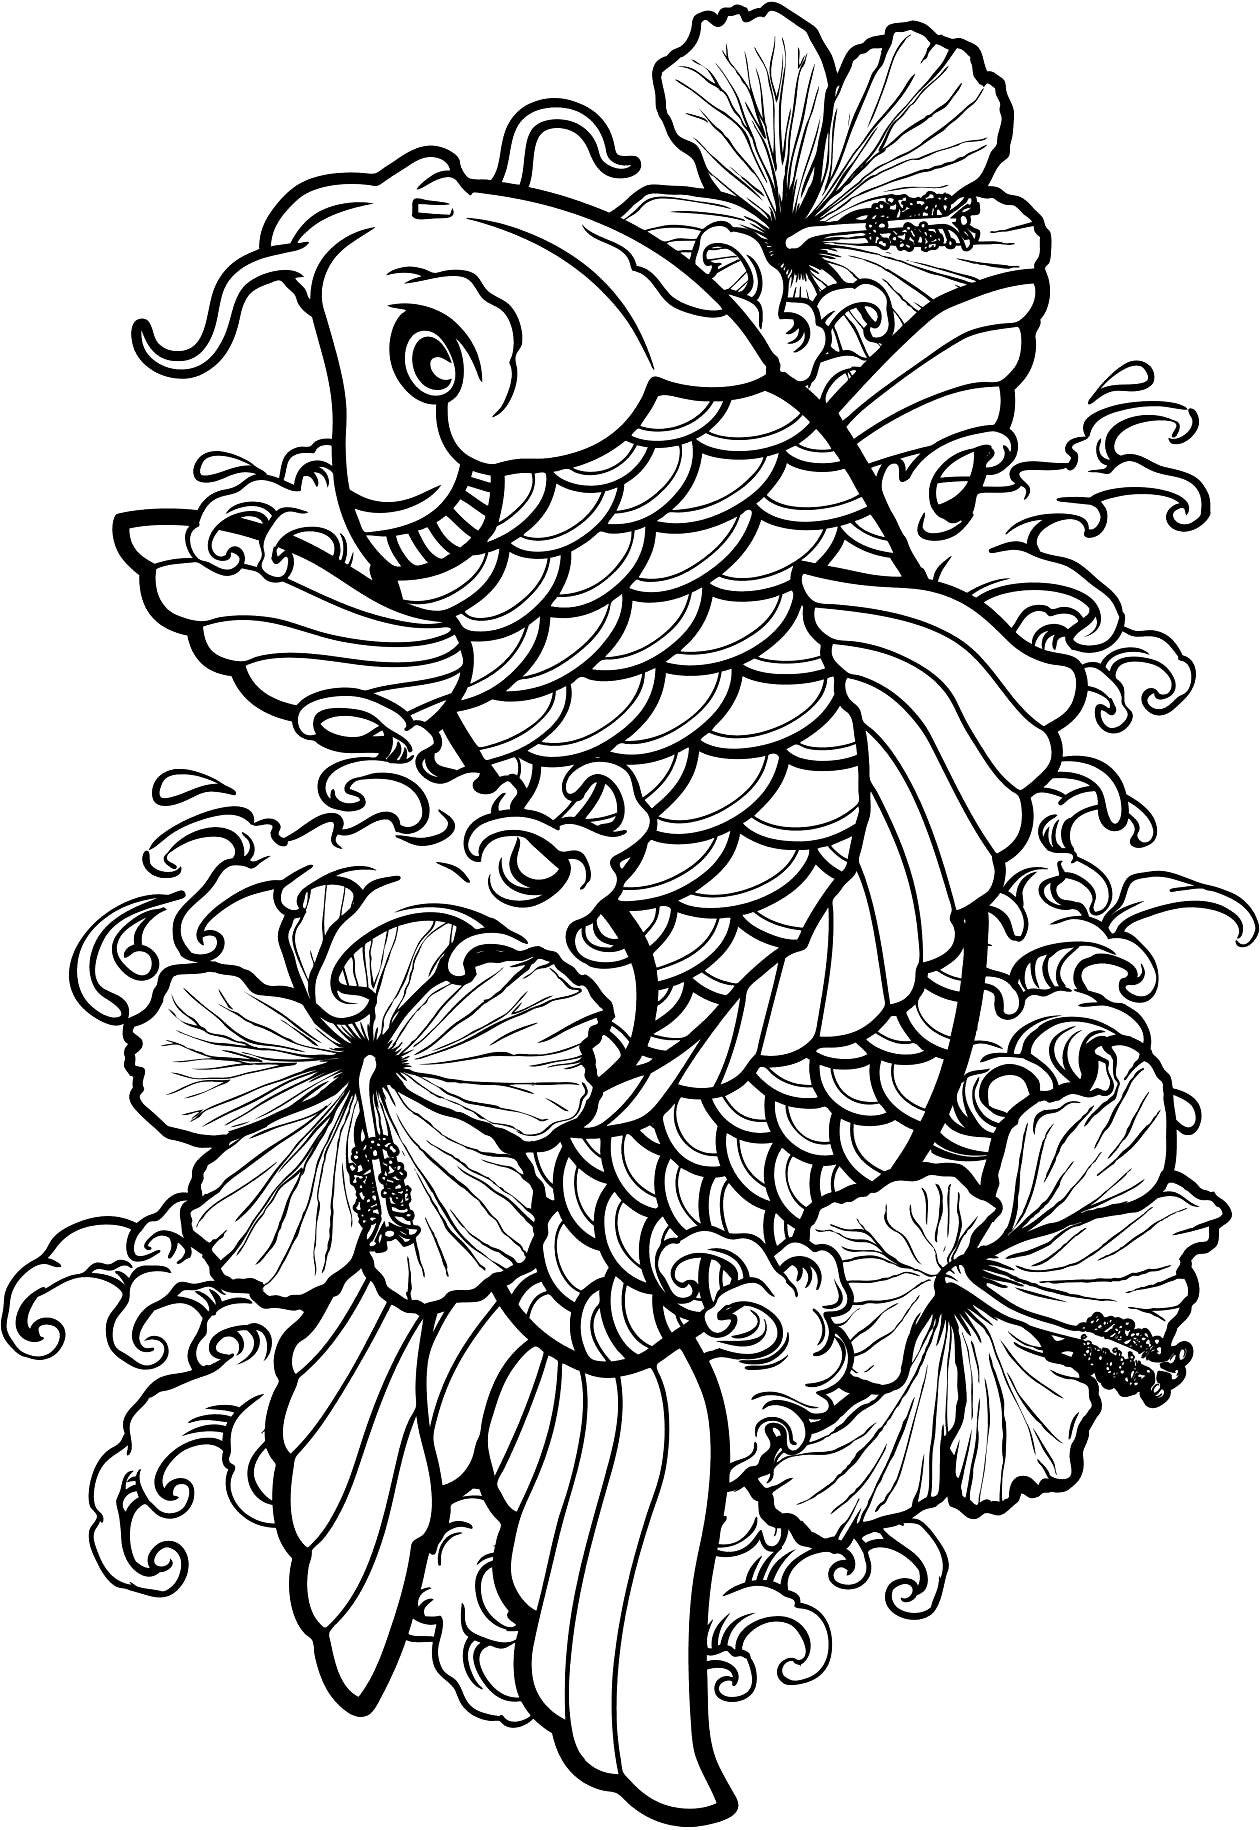 Pin de Juan Jose en Juanjo dibujos | Pinterest | Polo, Tinta y Apliques